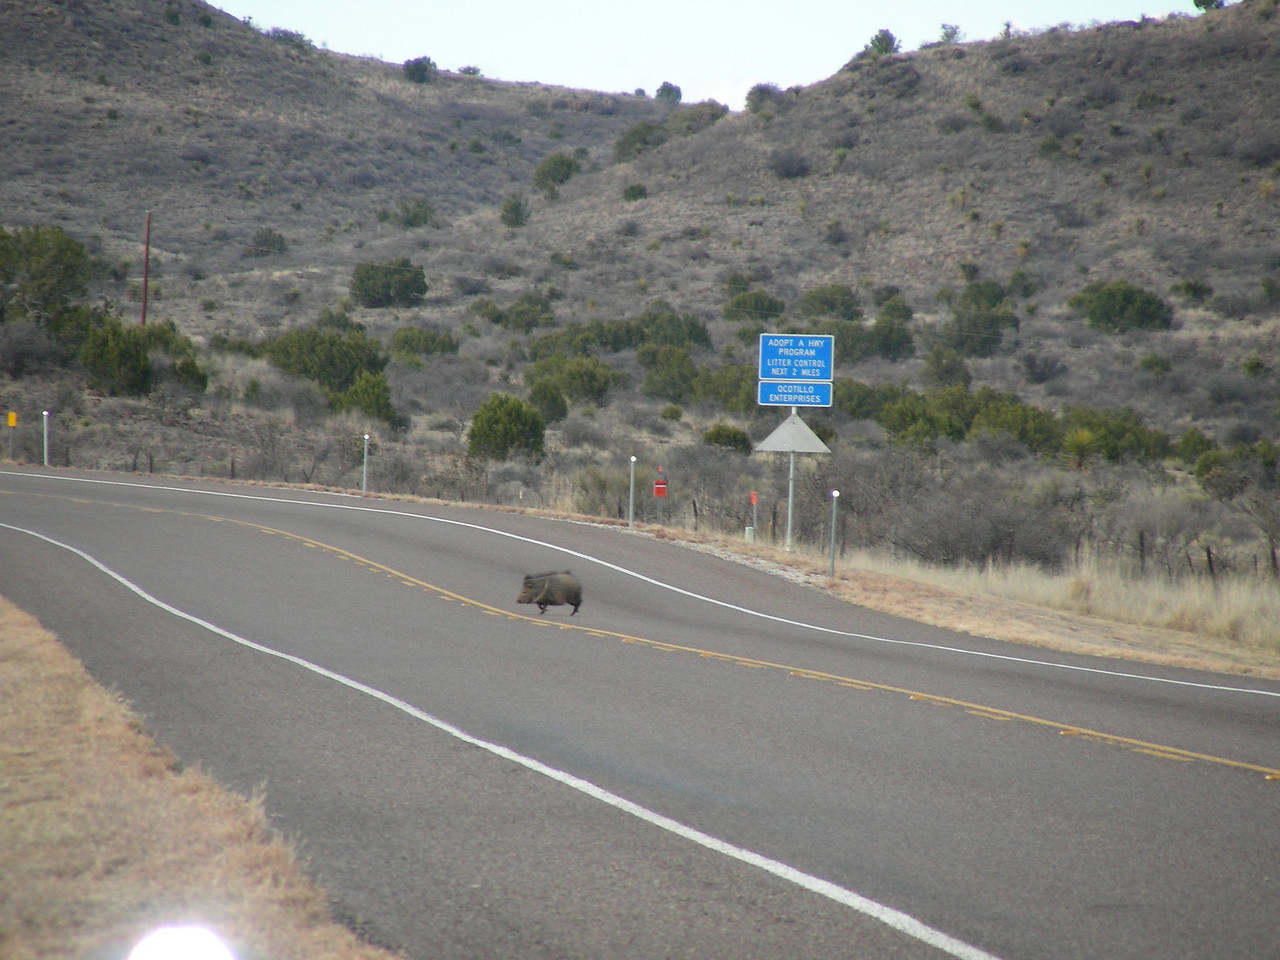 Javelinas or Collared Peccaries (Tayassu tajacu) along the road heading down to Terlingua, TX-118 | 3/7/2010